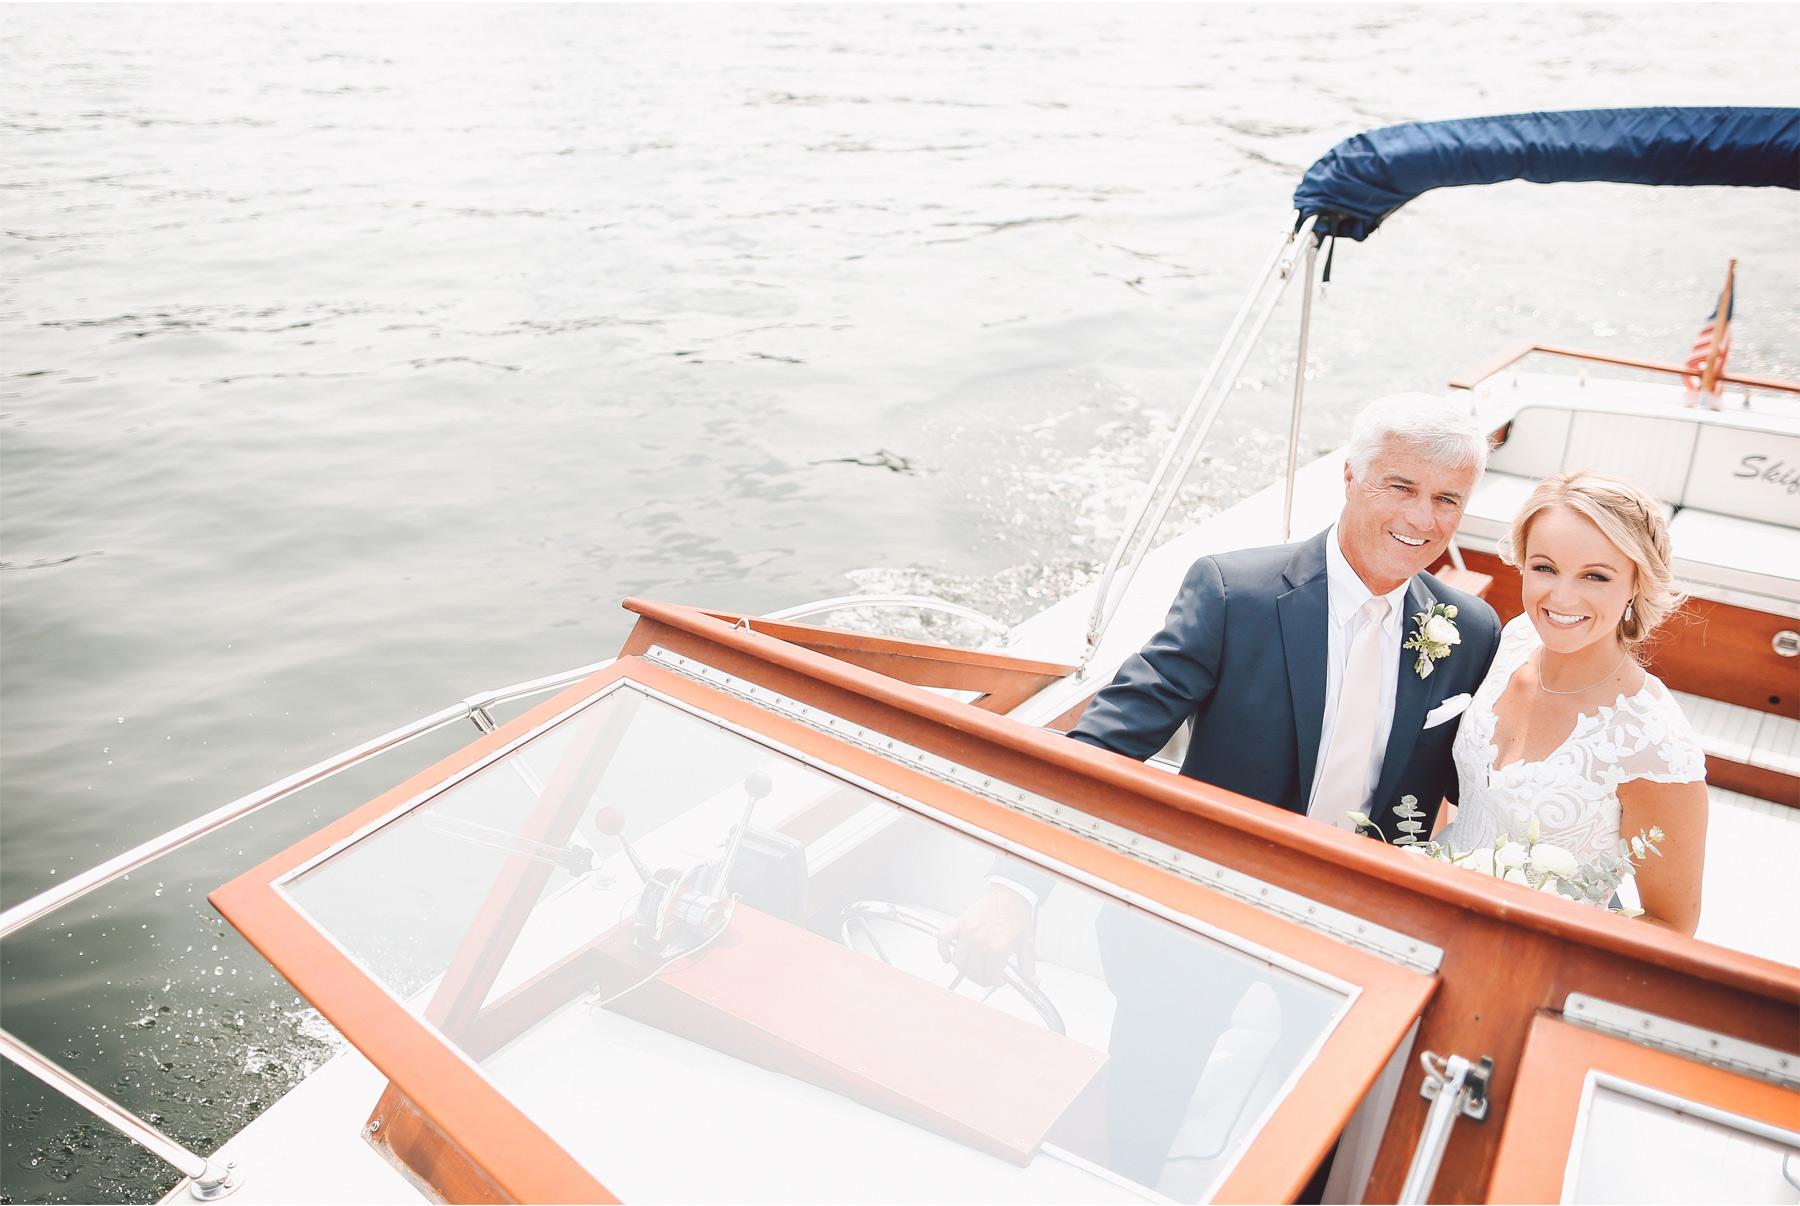 03-Minnetonka-Minnesota-Wedding-Photography-by-Vick-Photography-Boat-Lake-Minnetonka-First-Father-of-the-Bride-Jennifer-and-Adam.jpg